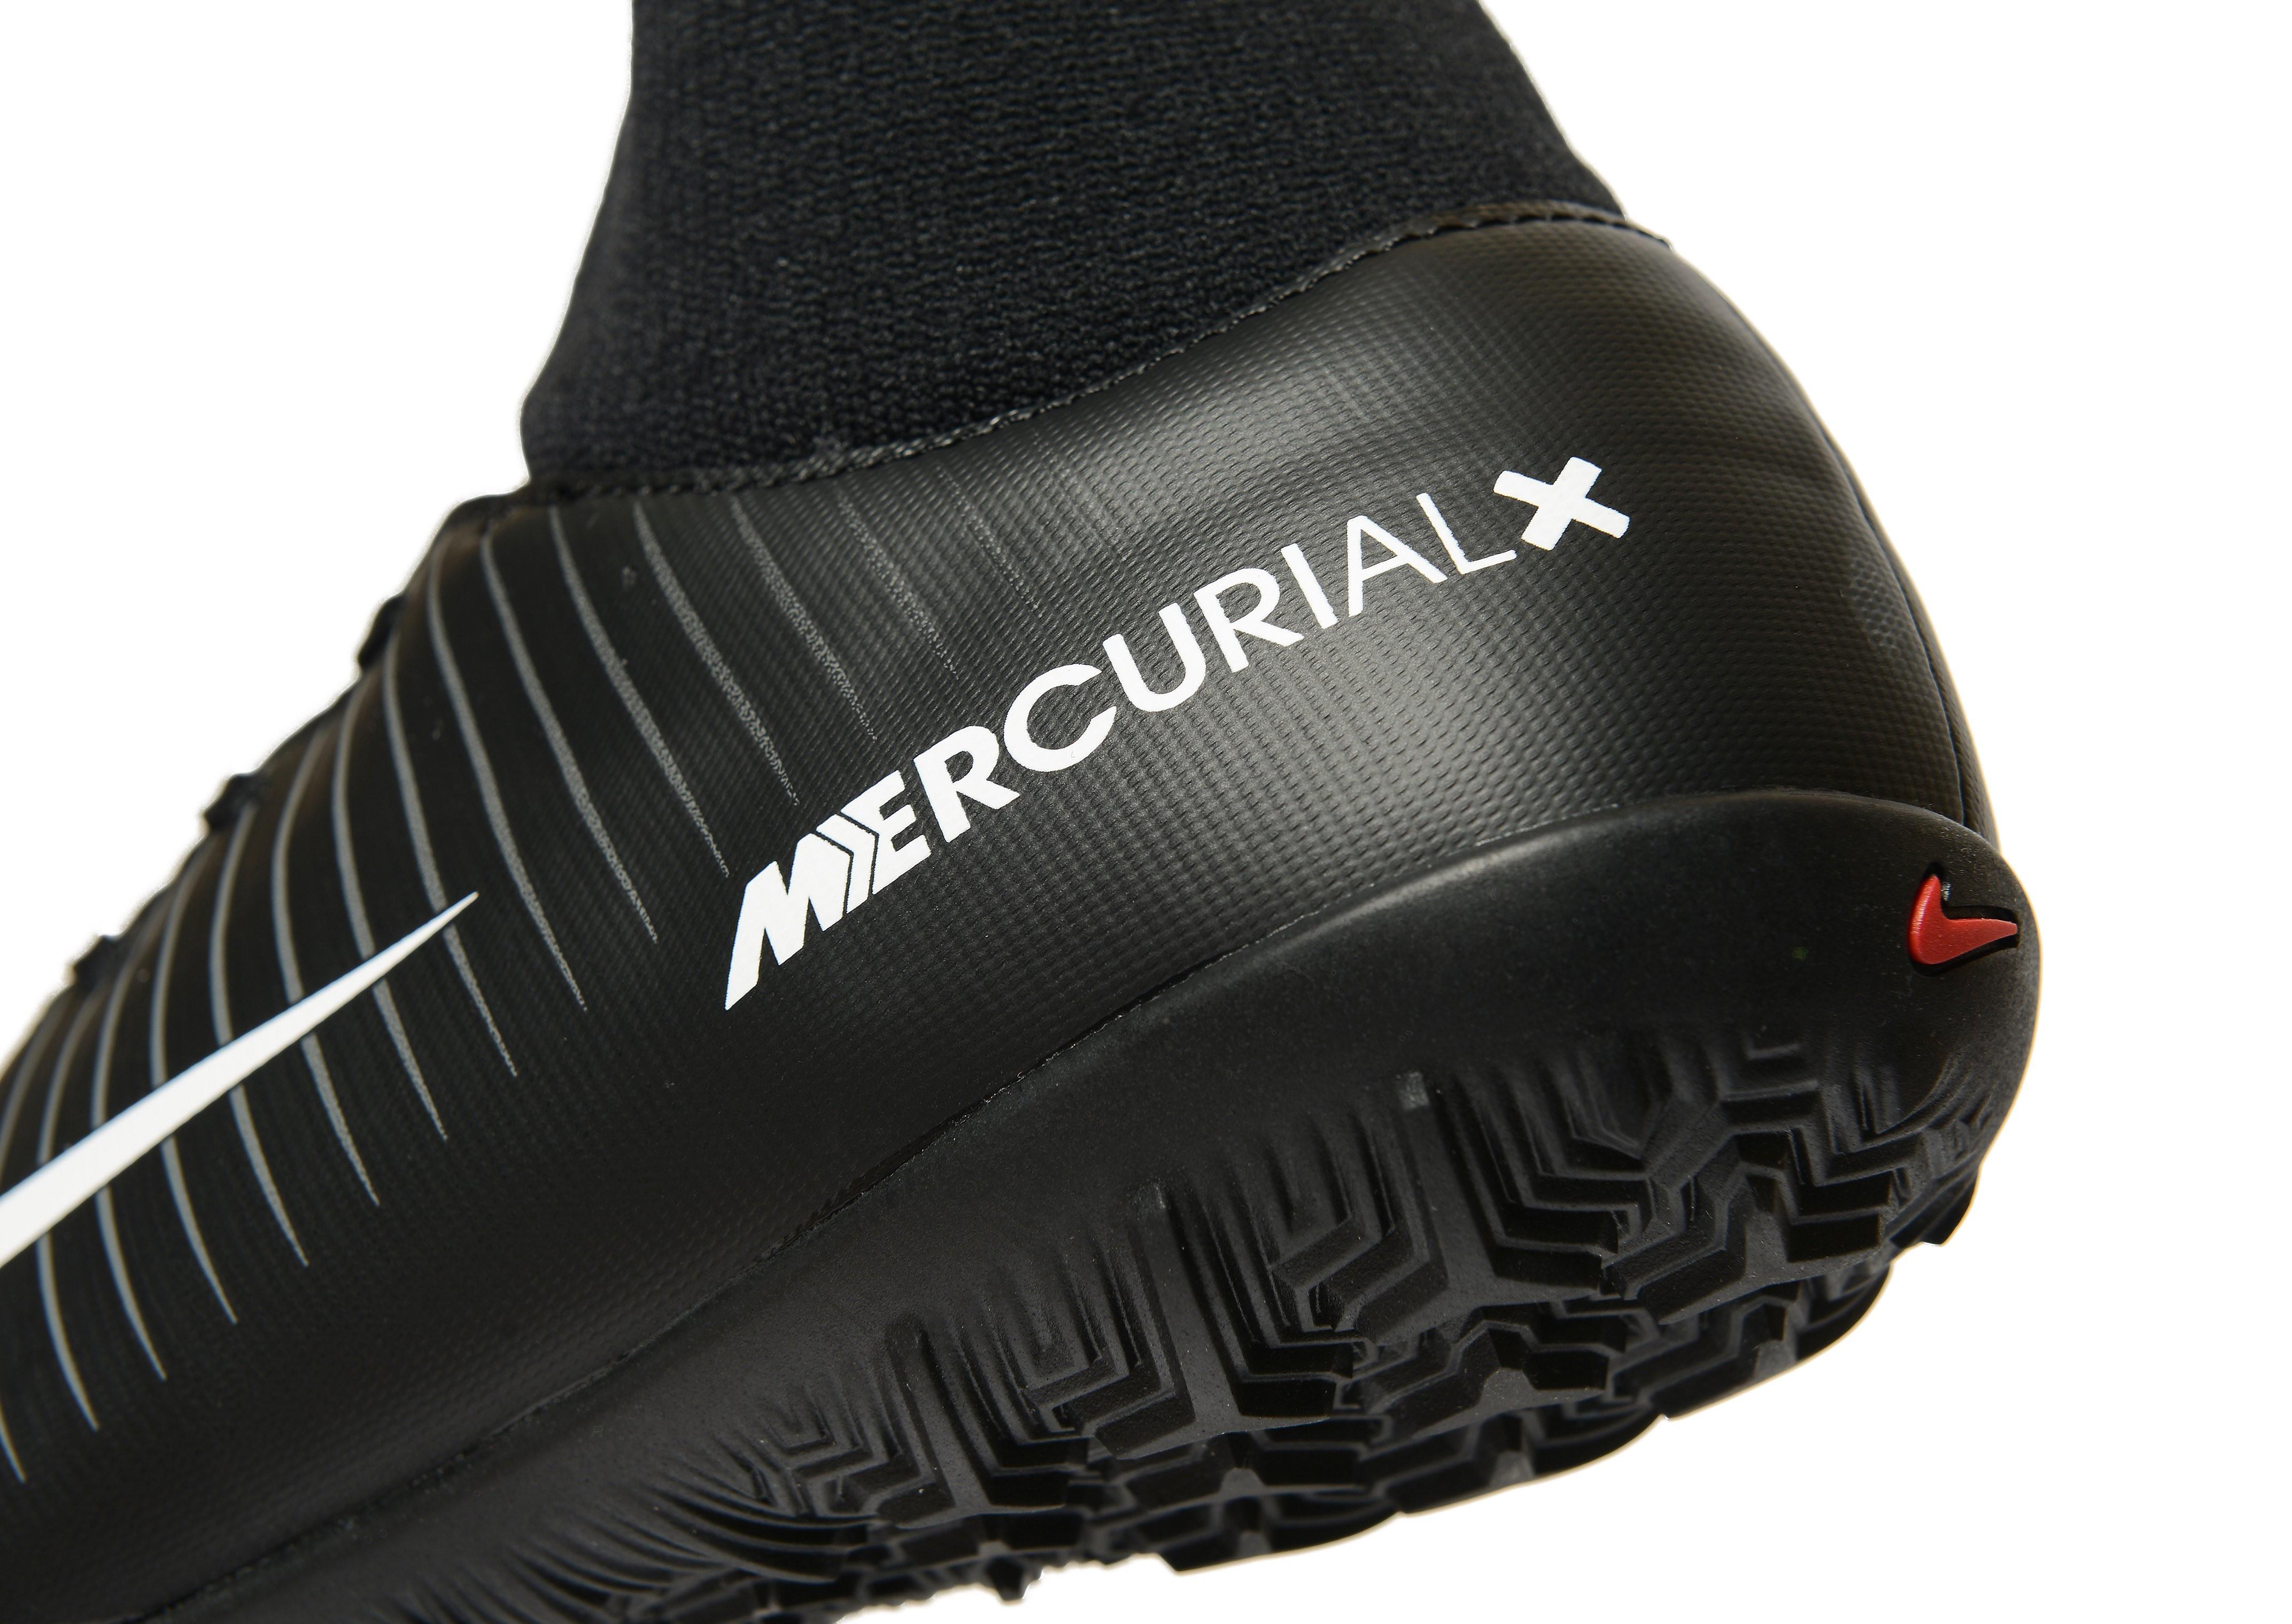 Nike Motion Blur Mercurial Veloce DF Astro Turf